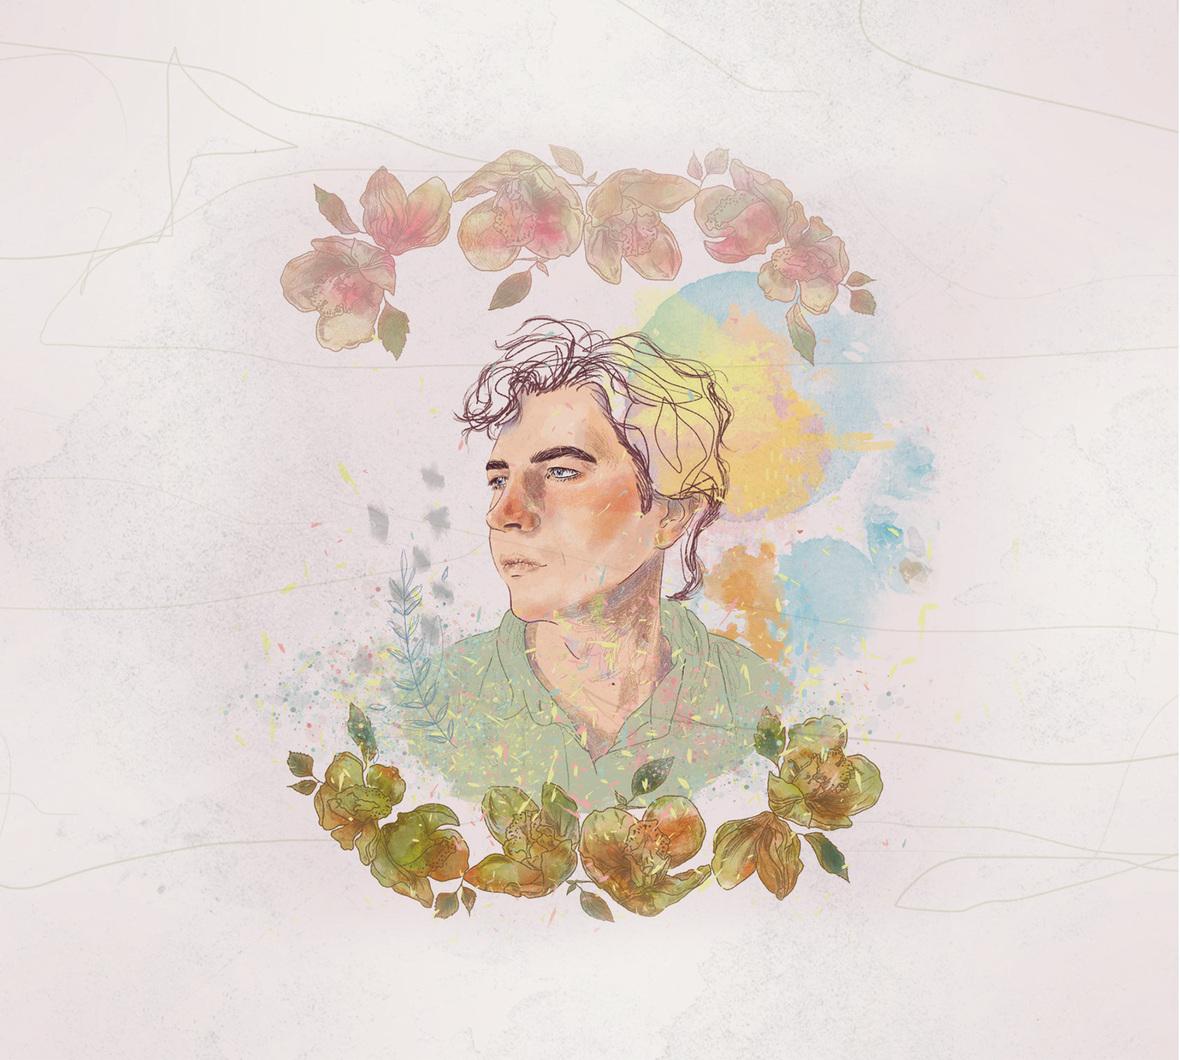 Wilder Atkins - Hope & Sorrow